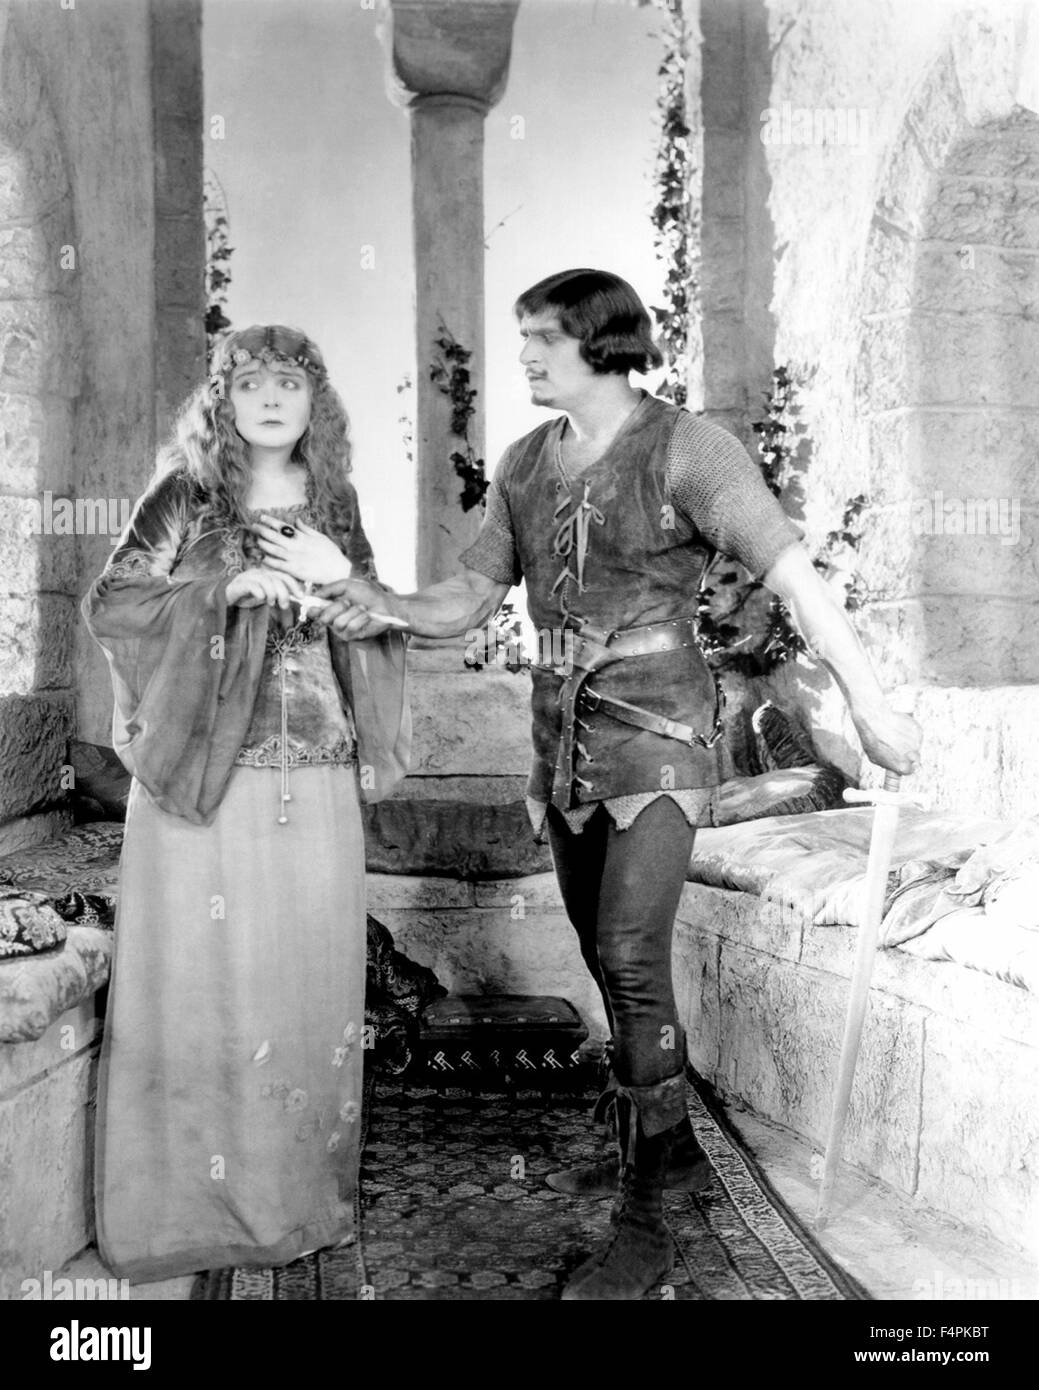 Enid Bennett and Douglas Fairbanks / Robin Hood / 1922 directed by Allan Dwan [United Artists] - Stock Image